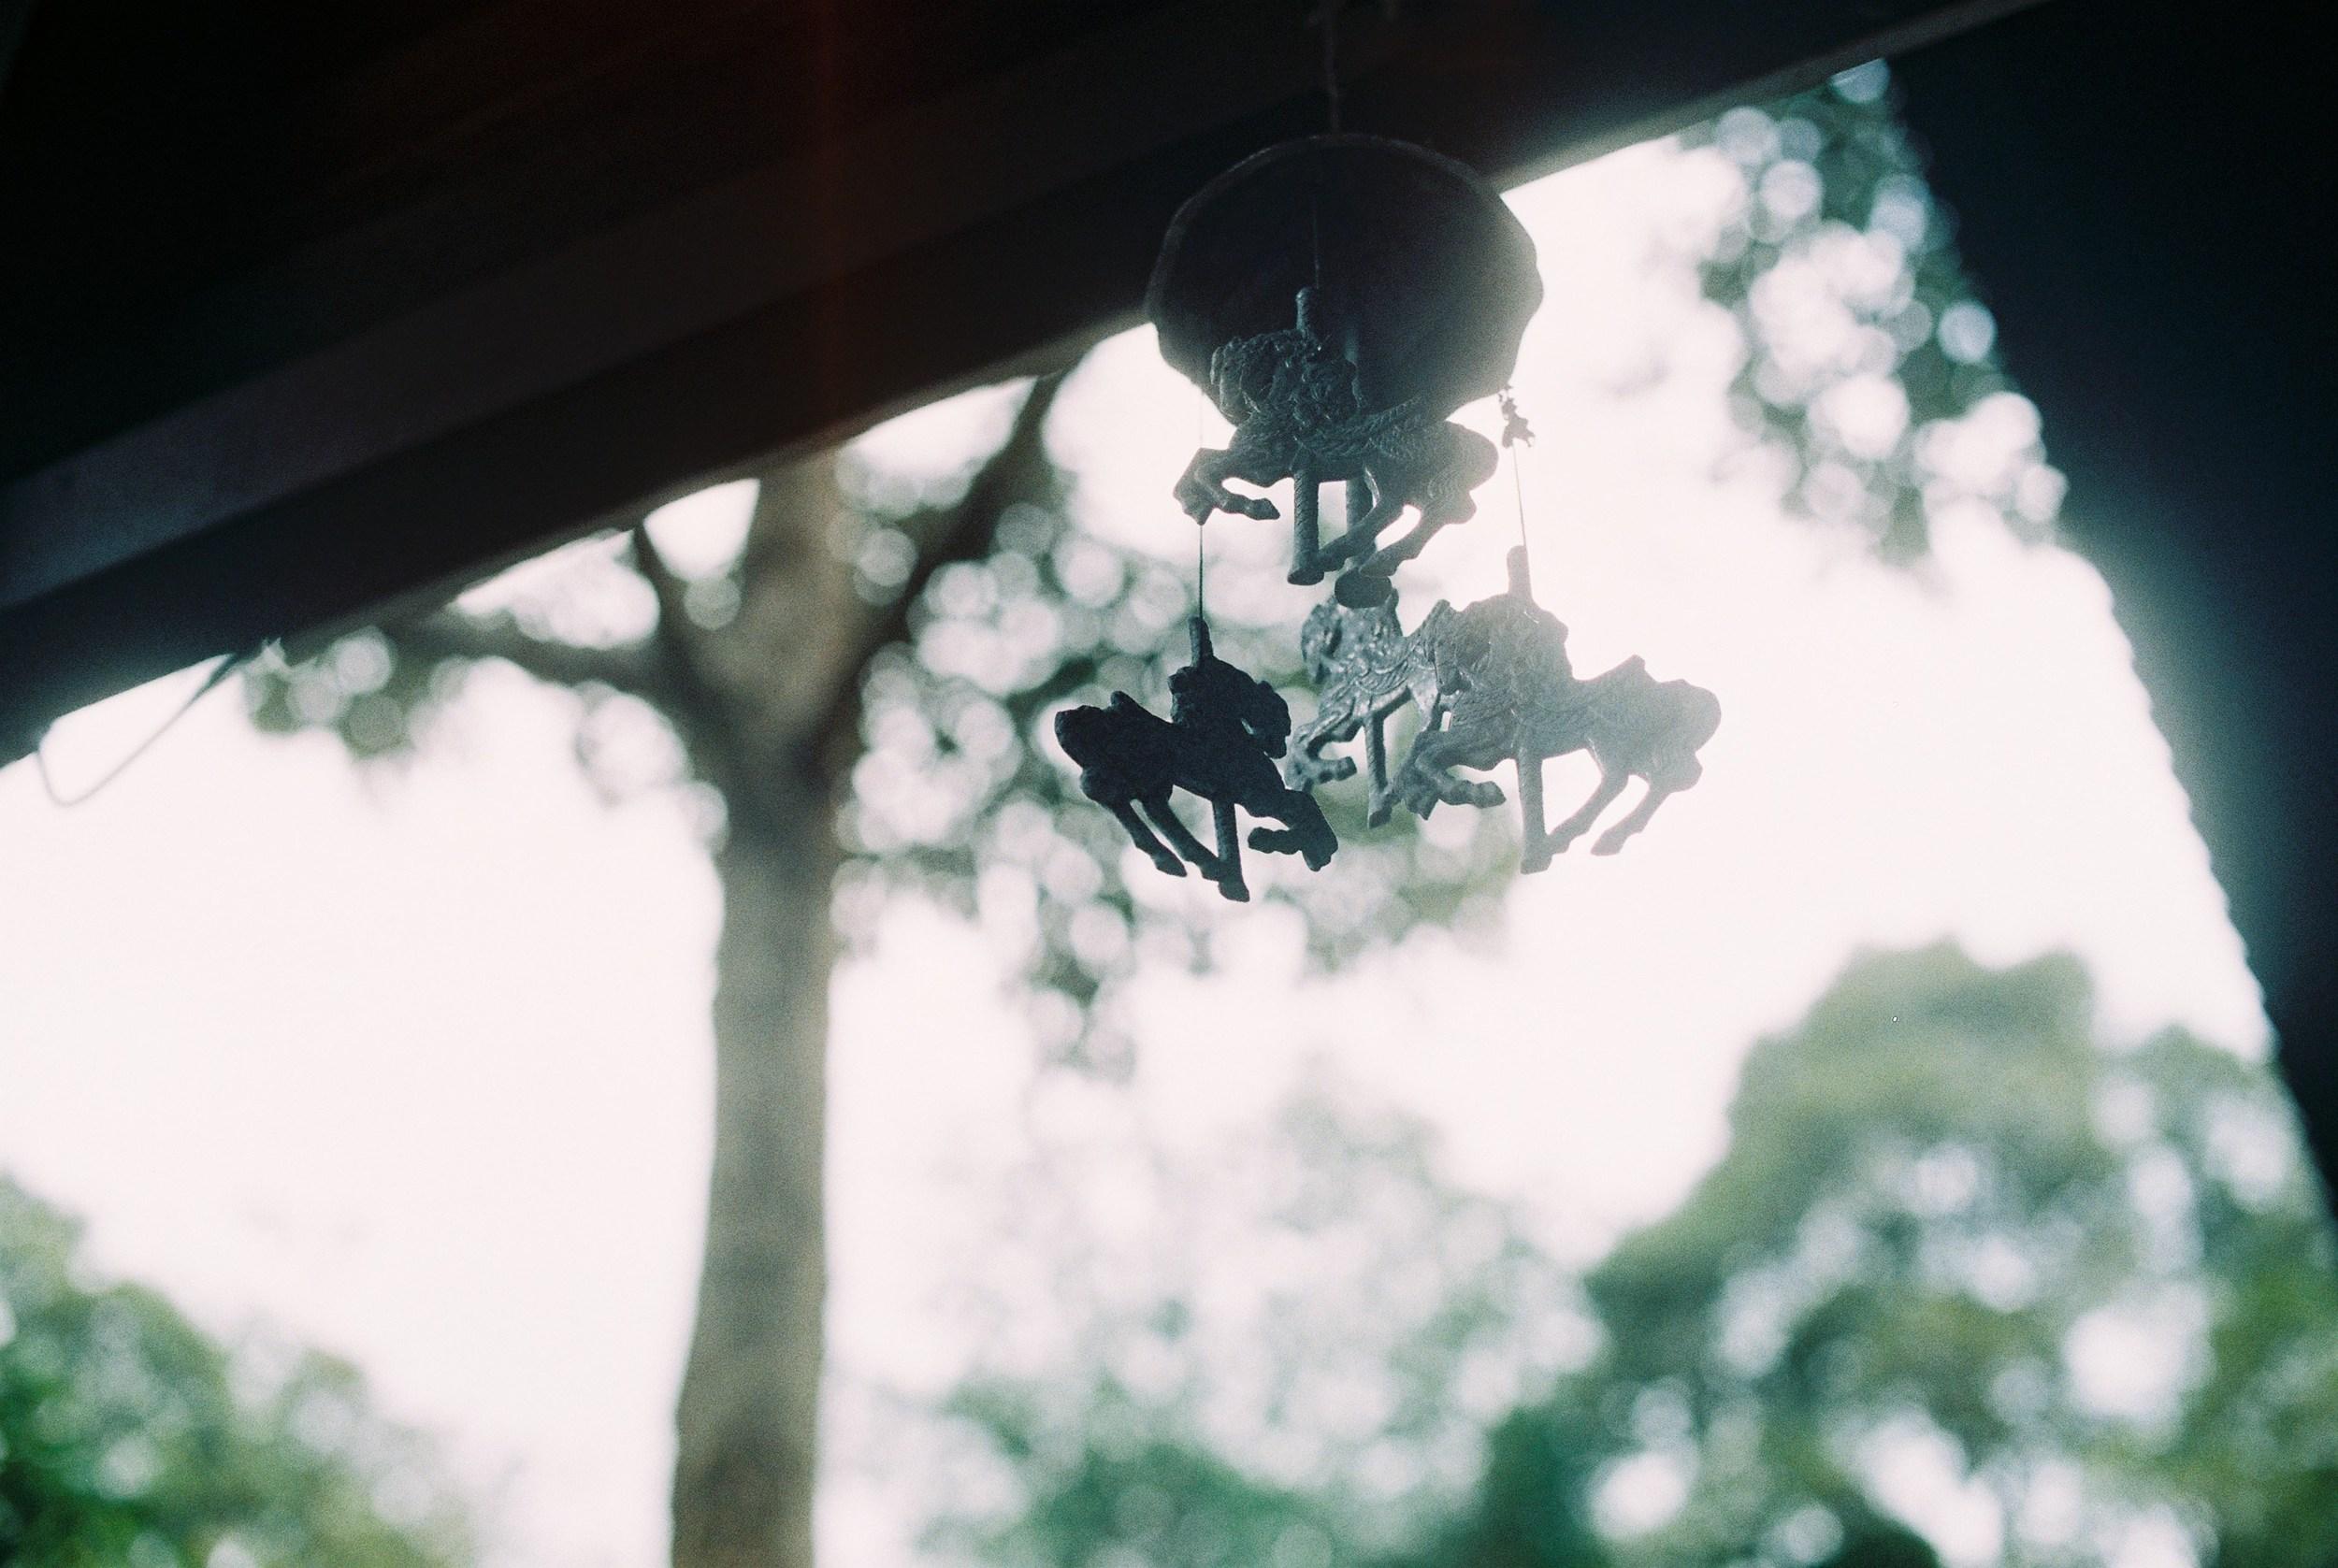 penang-film-photography-06.jpg